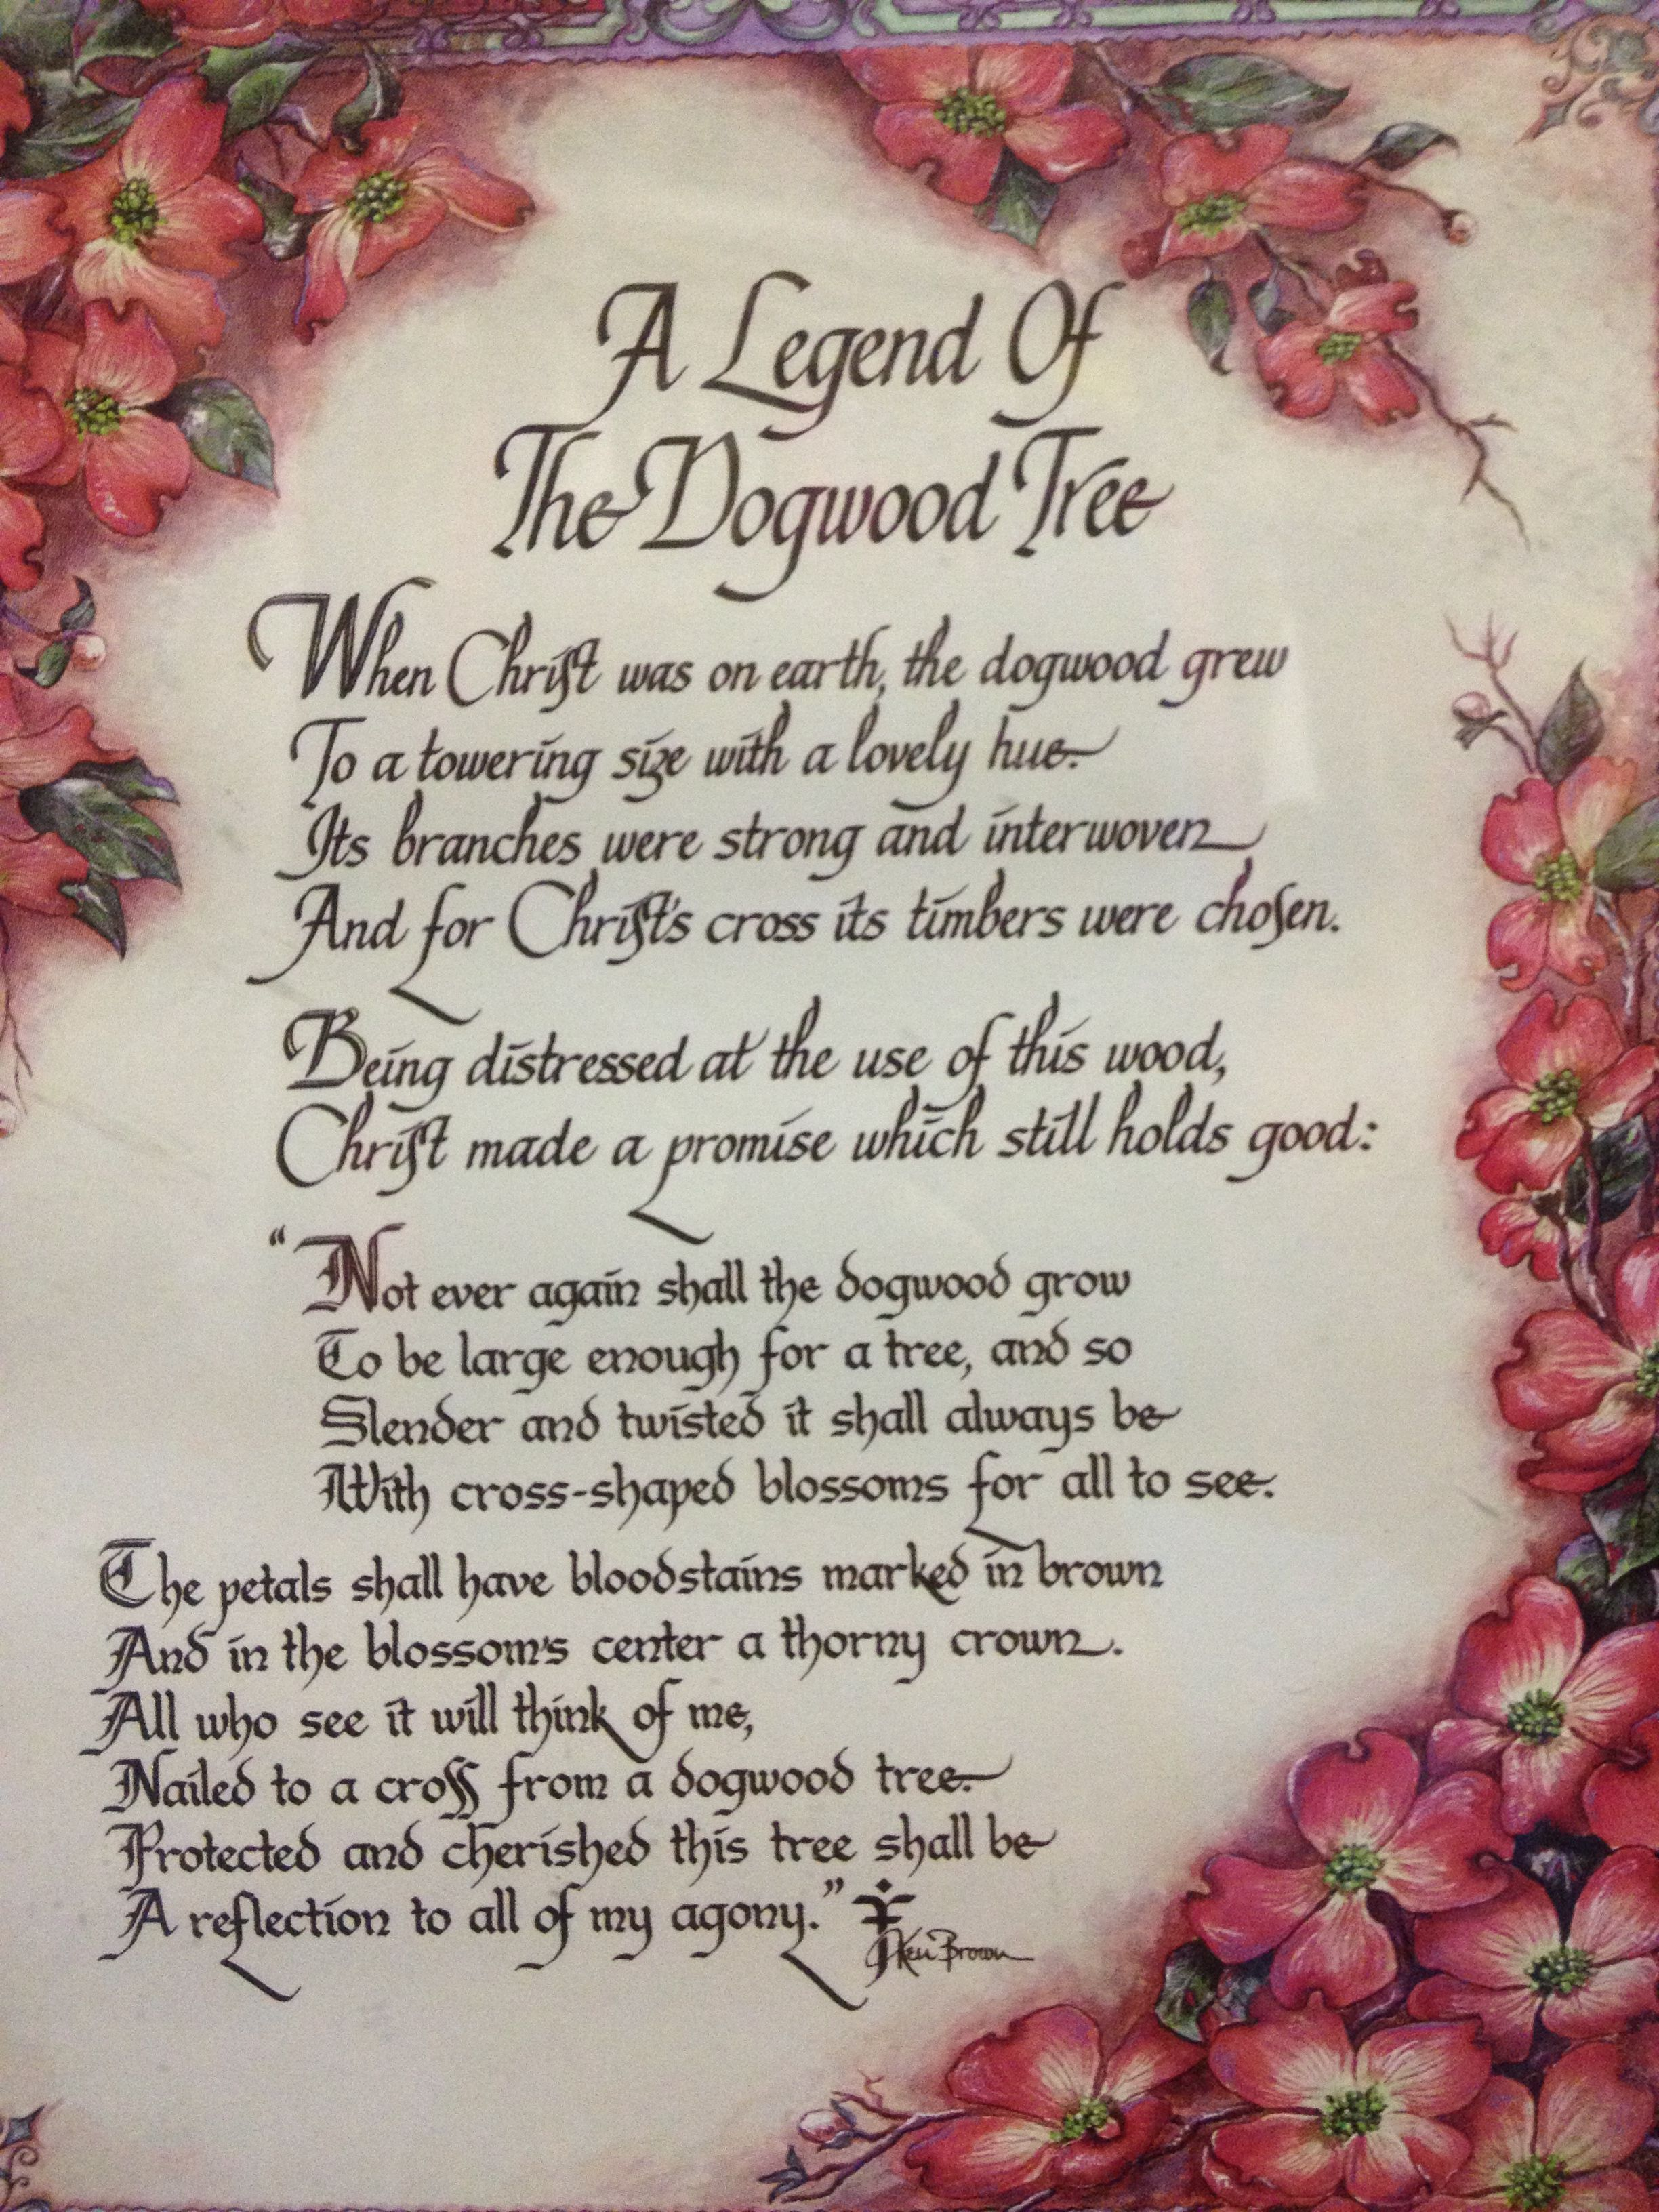 image regarding Legend of the Dogwood Tree Printable identify Legend Of Dogwood Trees Trees Dogwood trees, Blossom